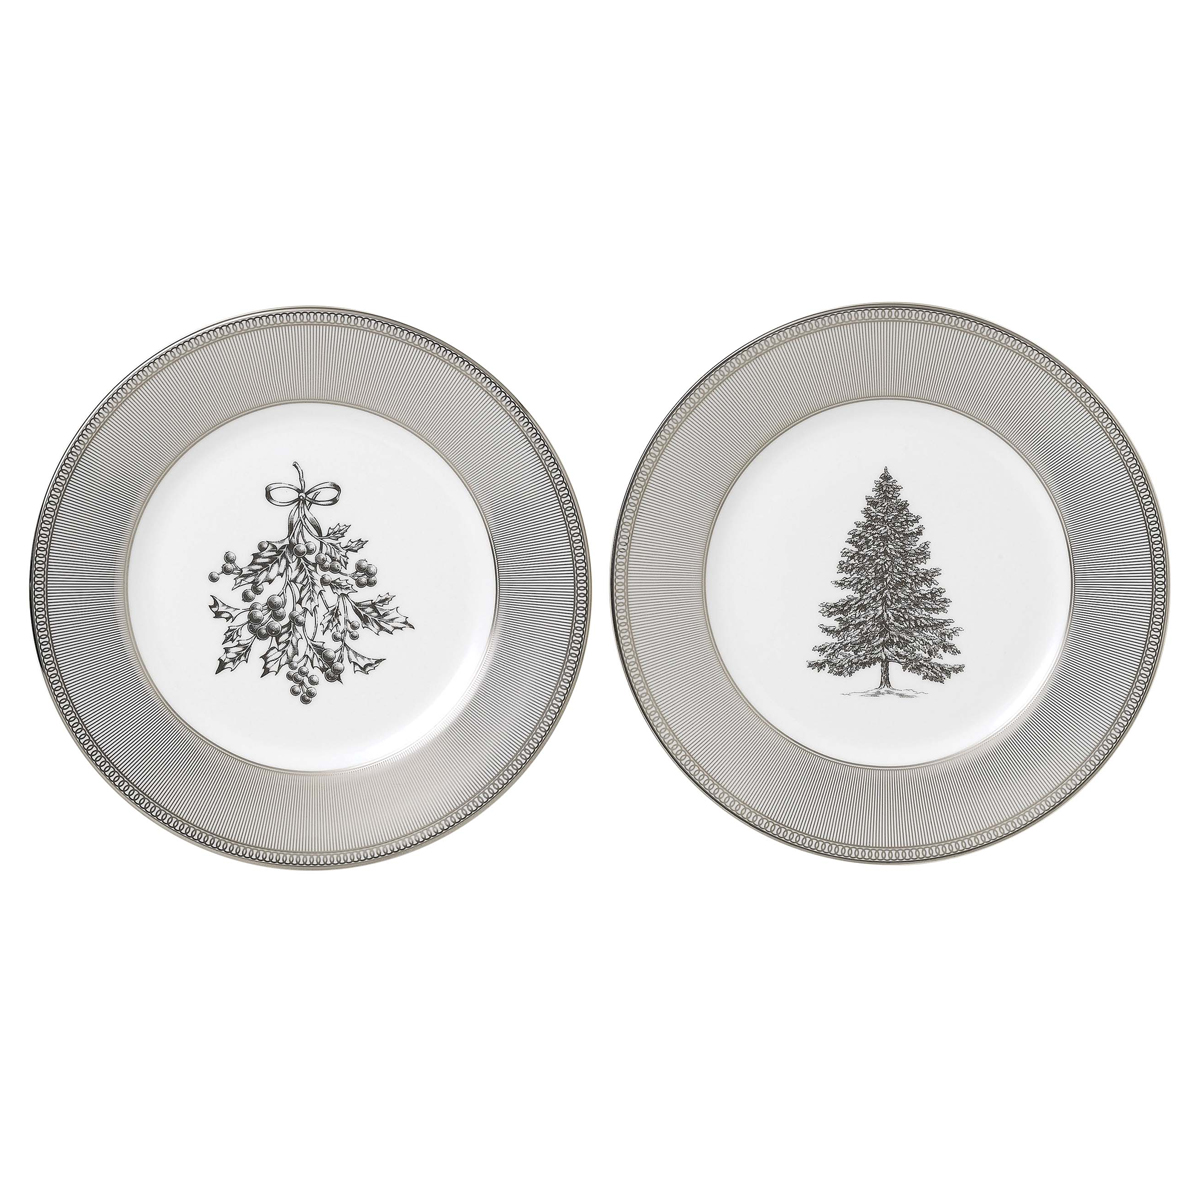 "Wedgwood 2021 Winter White Salad Plate 8"" Pair"